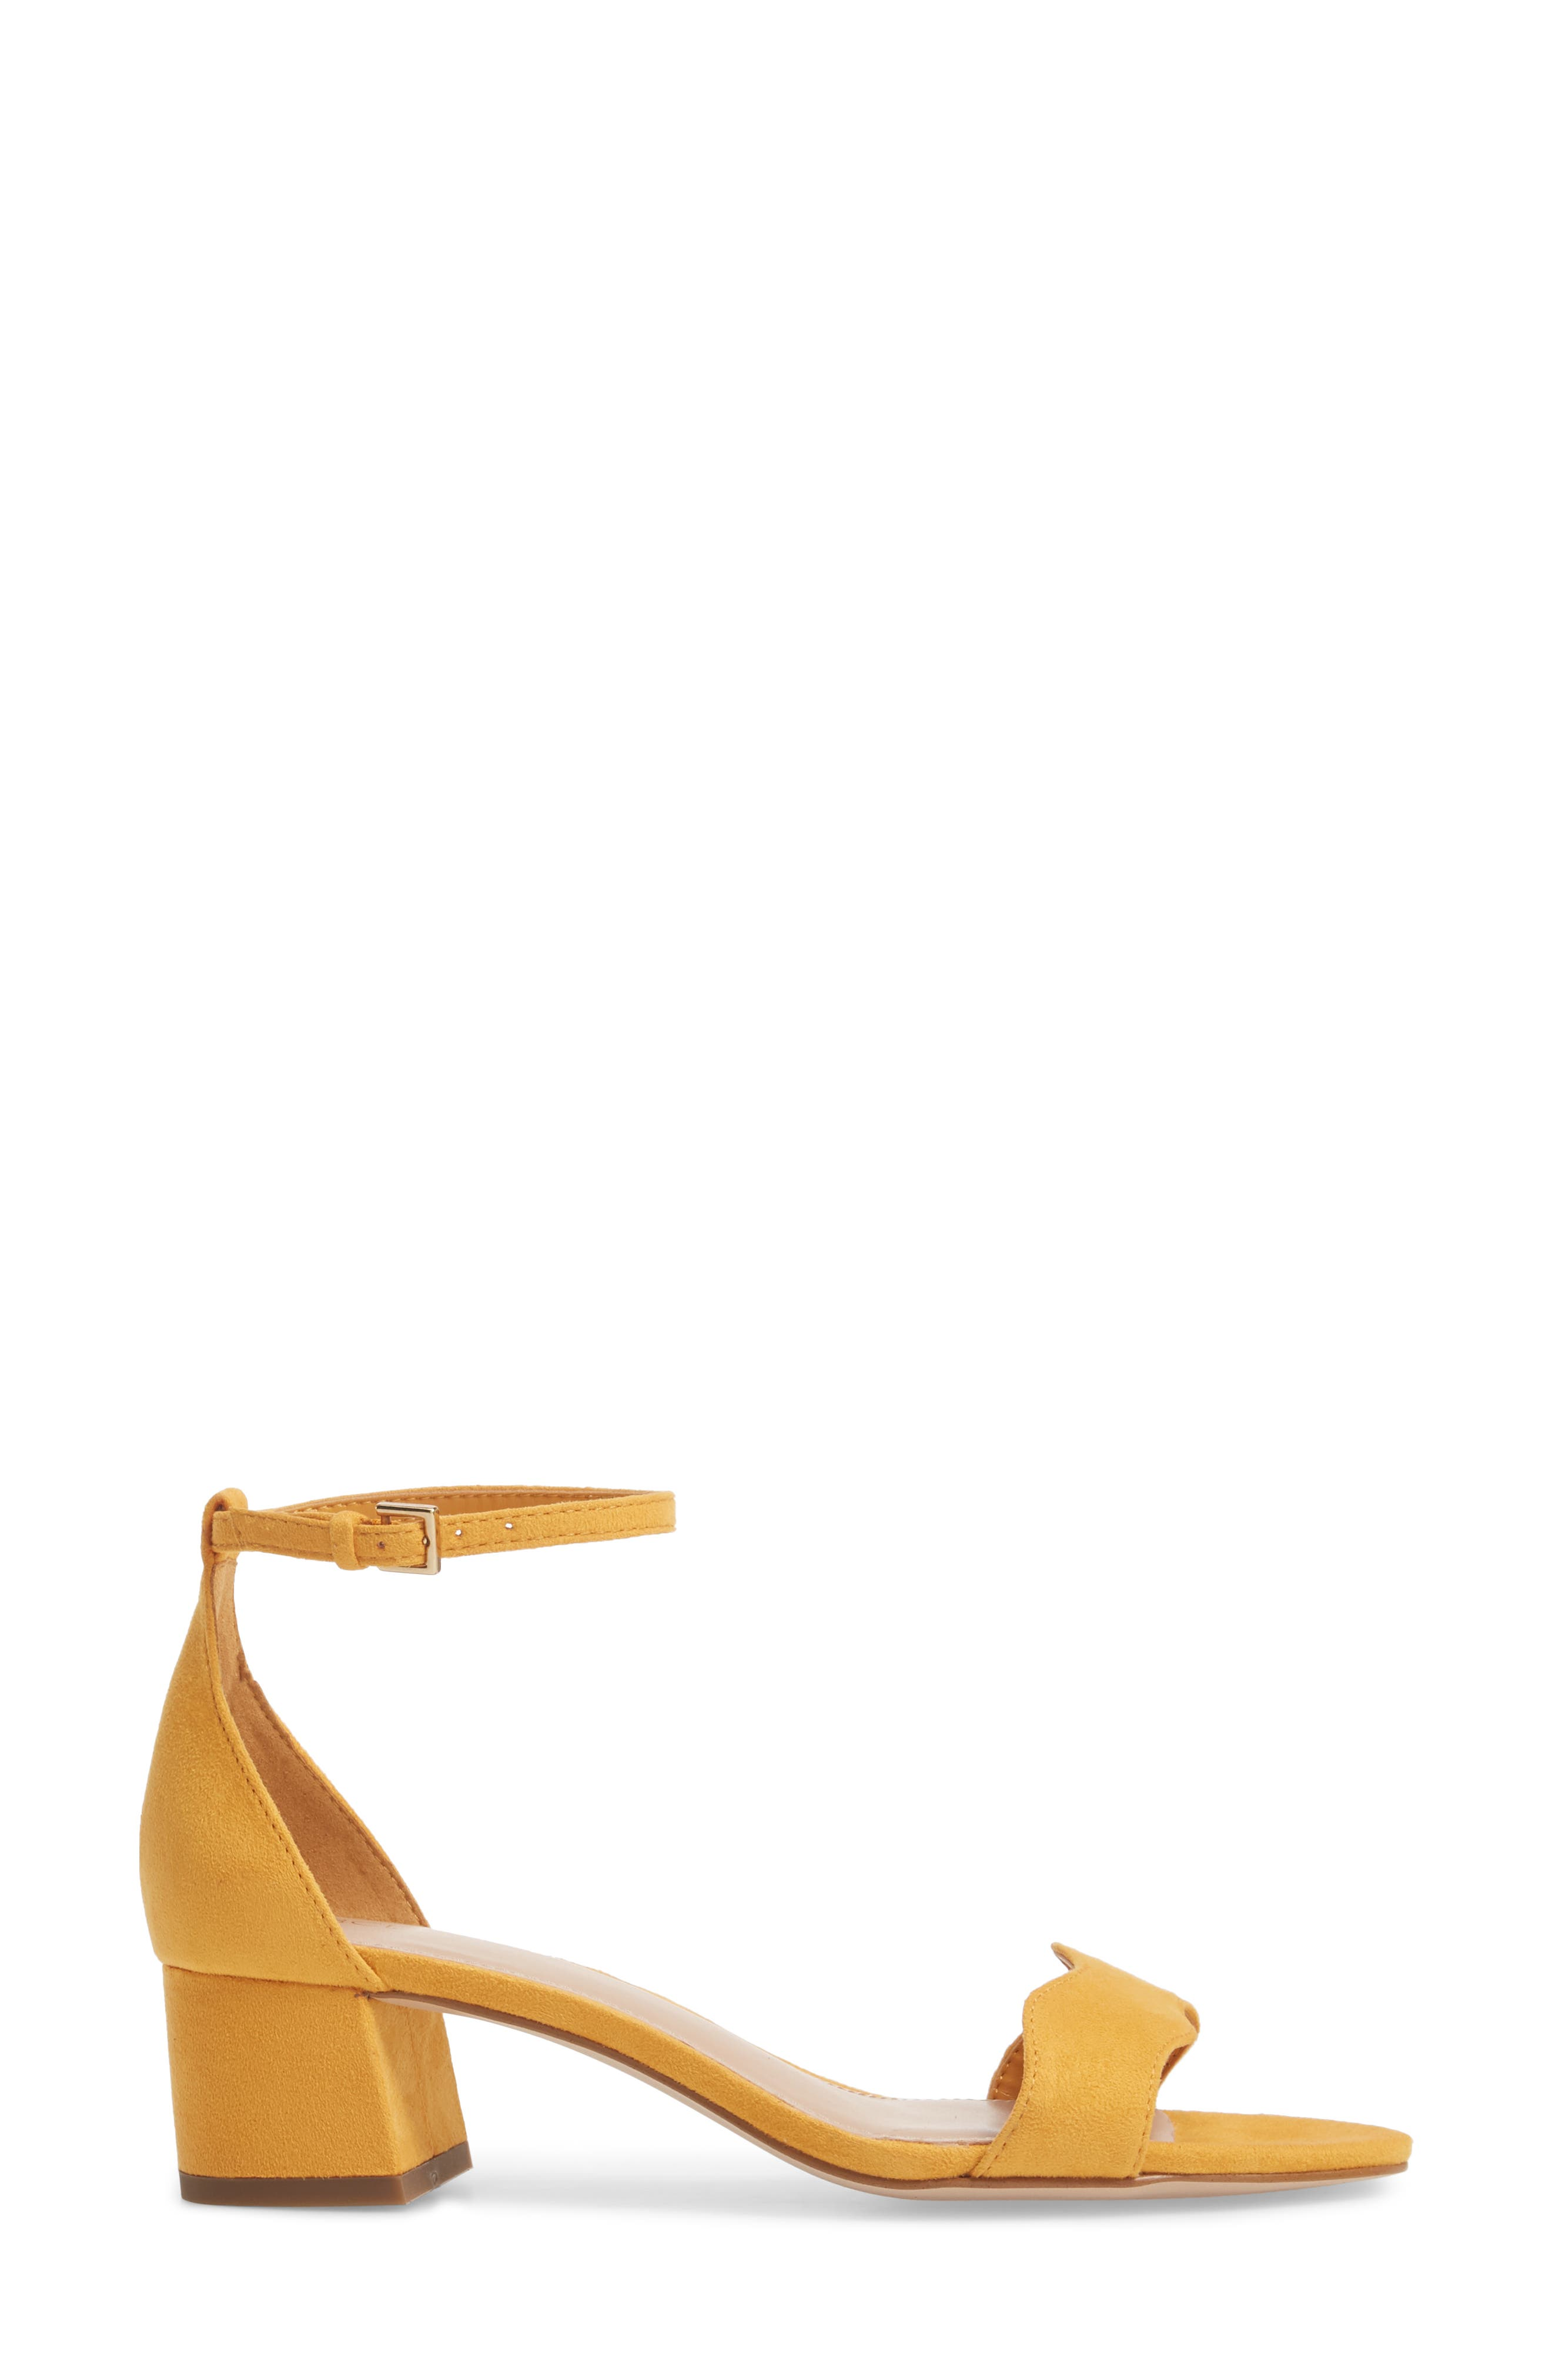 Farlyn Ankle Strap Sandal,                             Alternate thumbnail 3, color,